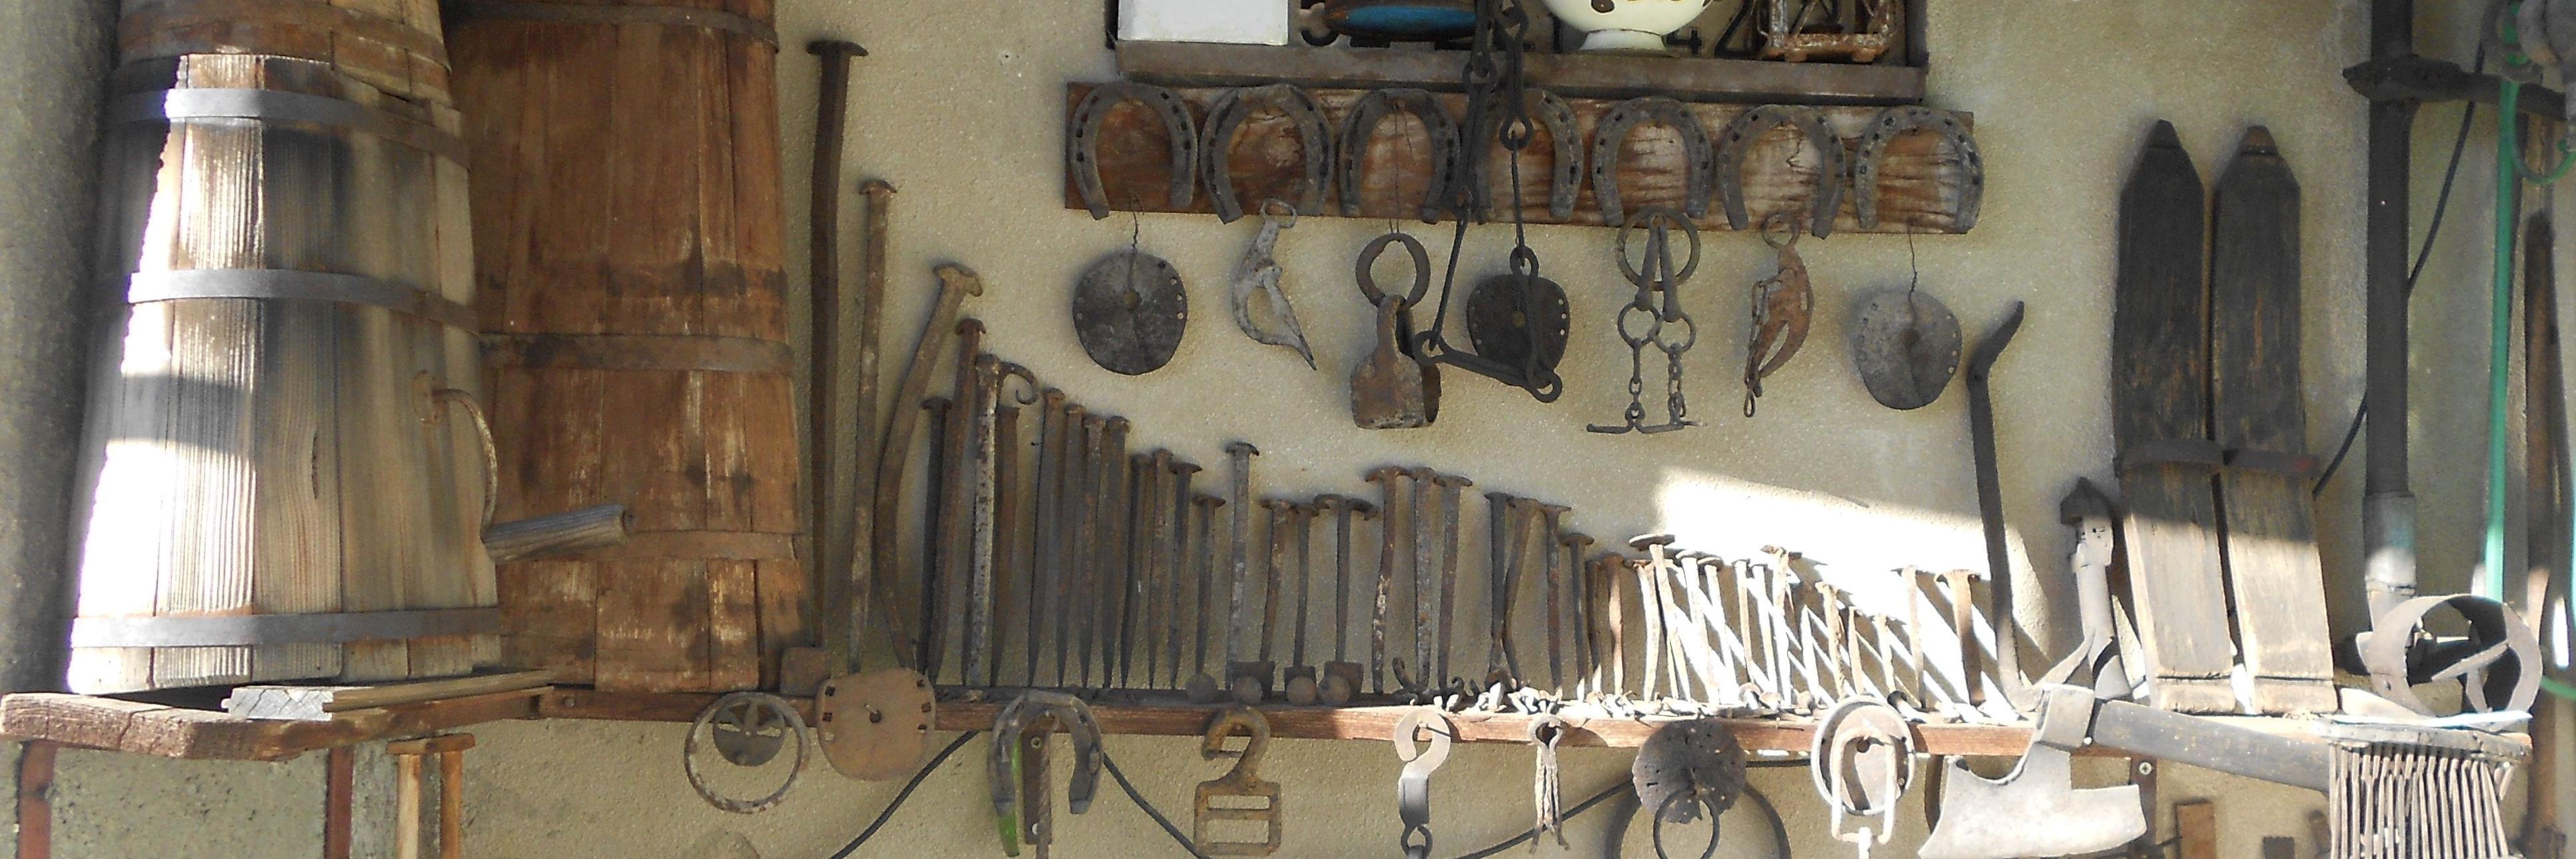 Музей ремёсел в Ливно